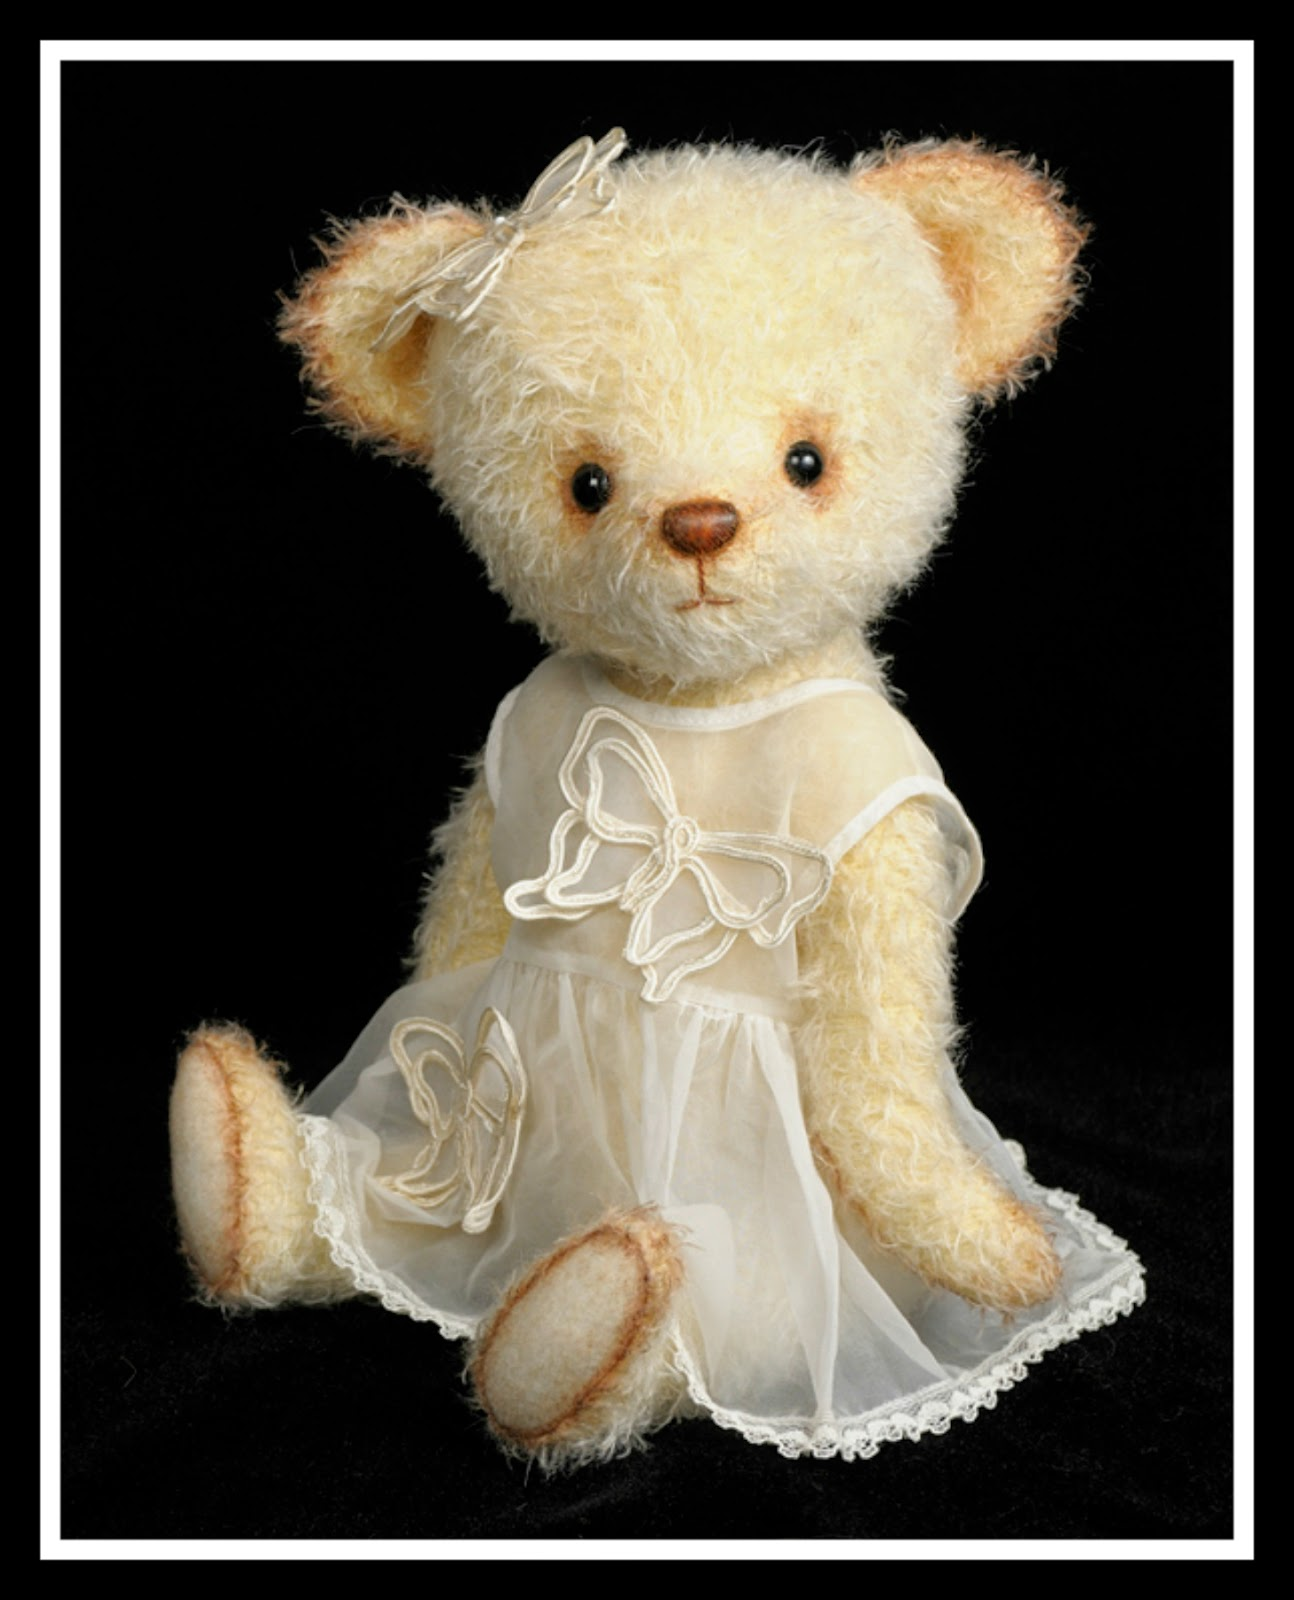 https://www.etsy.com/listing/223655375/mohair-stuffed-teddy-bear-pdf-pattern?ref=shop_home_active_2